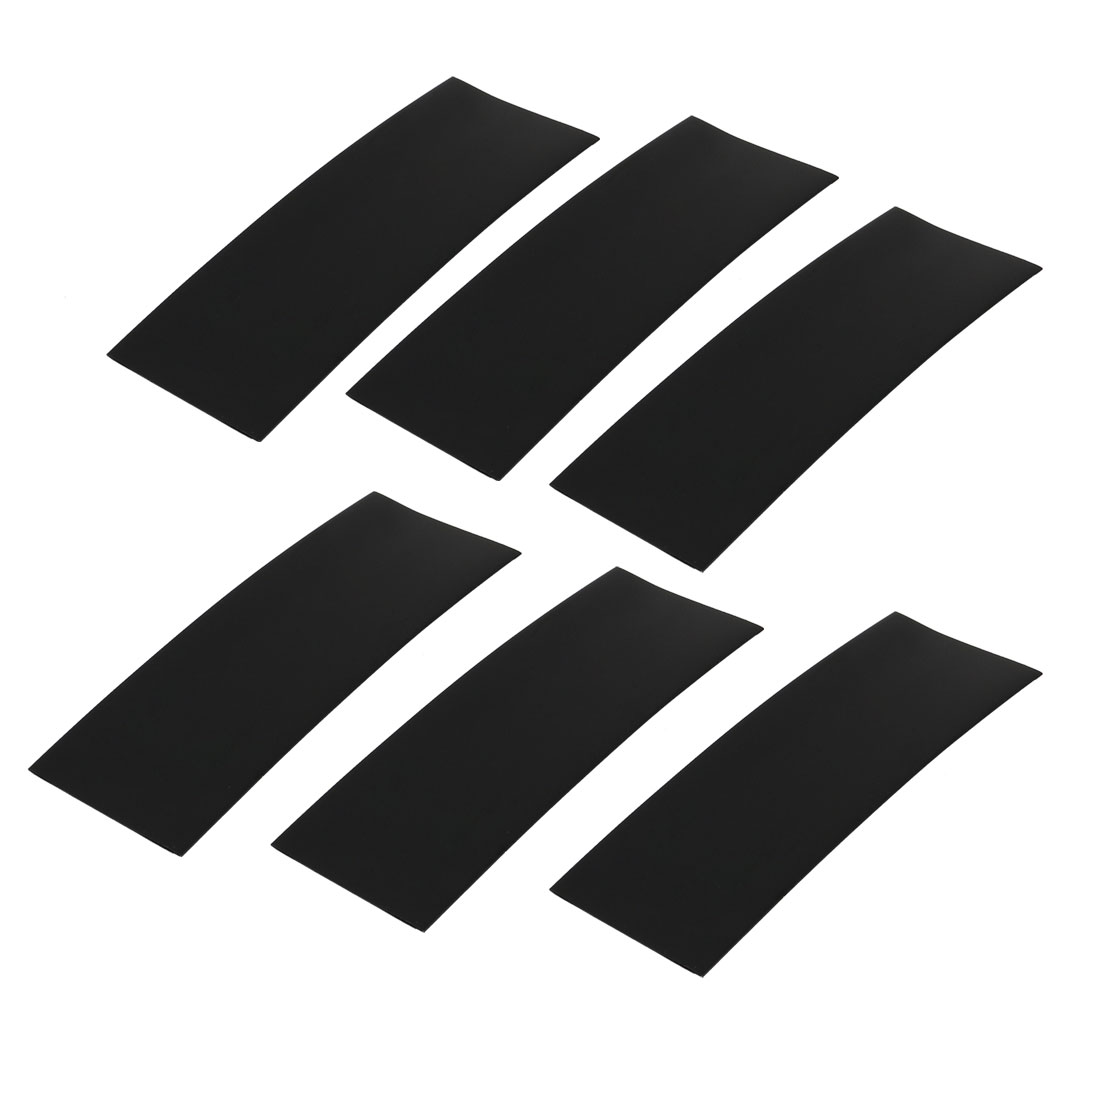 6pcs 17mm Flat Width 46mm Length PVC Heat Shrinkable Tube Black for AAA Battery